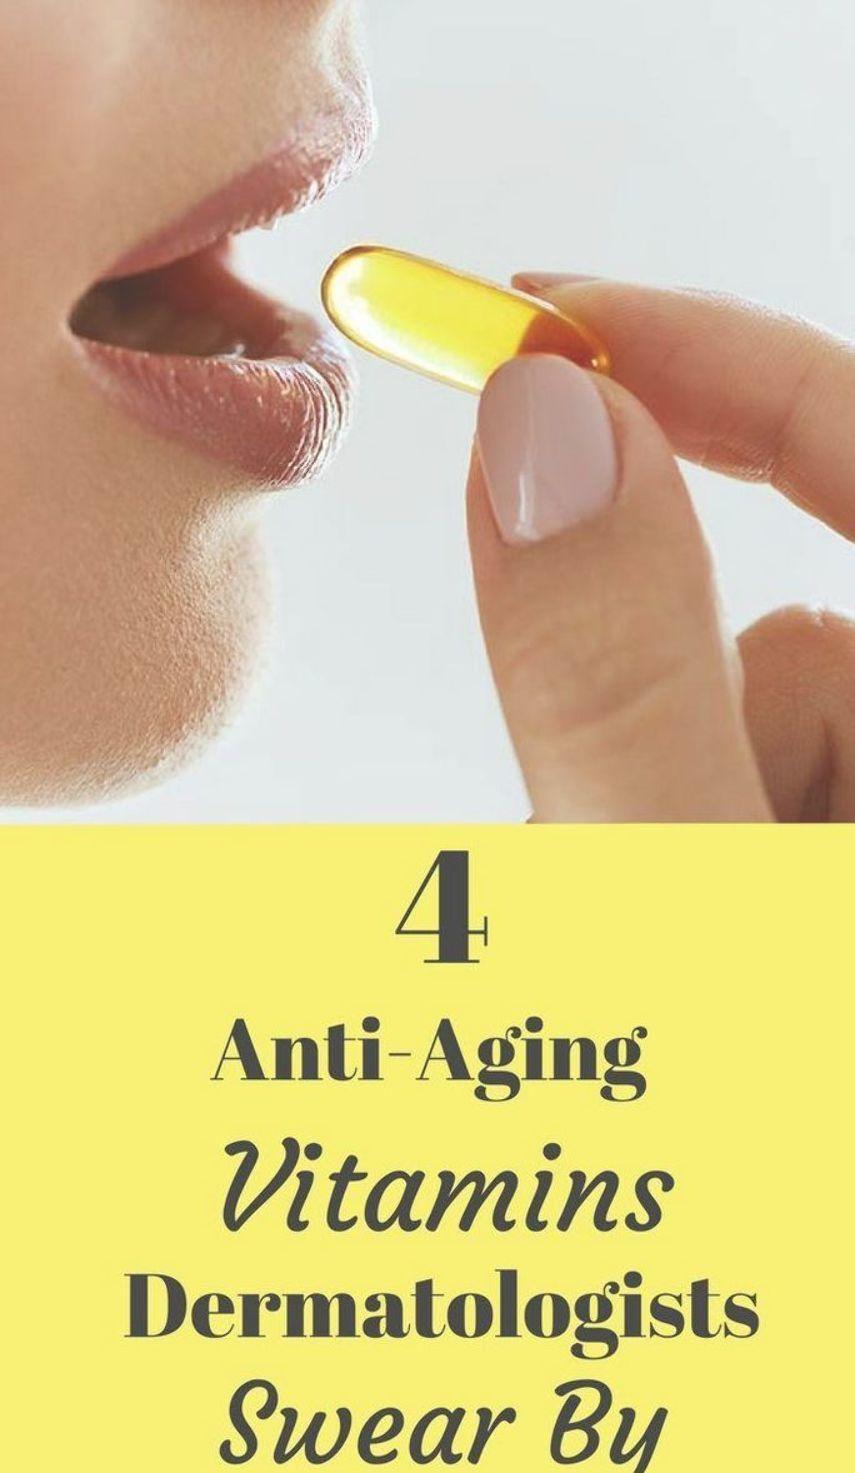 4 Anti-Aging Vitamins Dermatologists Swear By. #beauty #style #fashion #hair #makeup #skincare #nail...